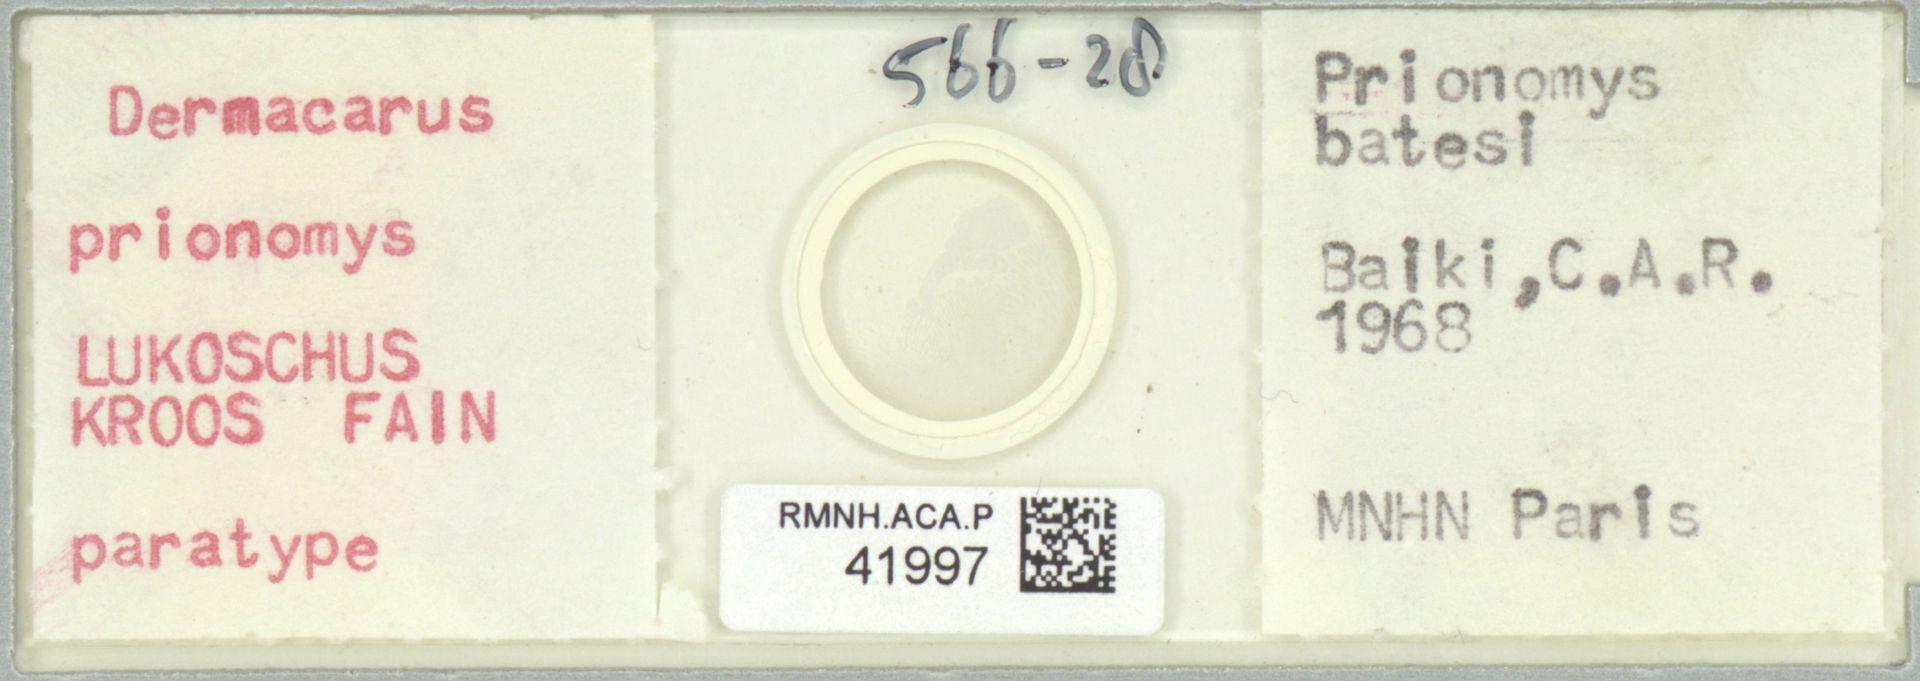 RMNH.ACA.P.41997 | Dermacarus prionomys Lukoschus Kroos Fain